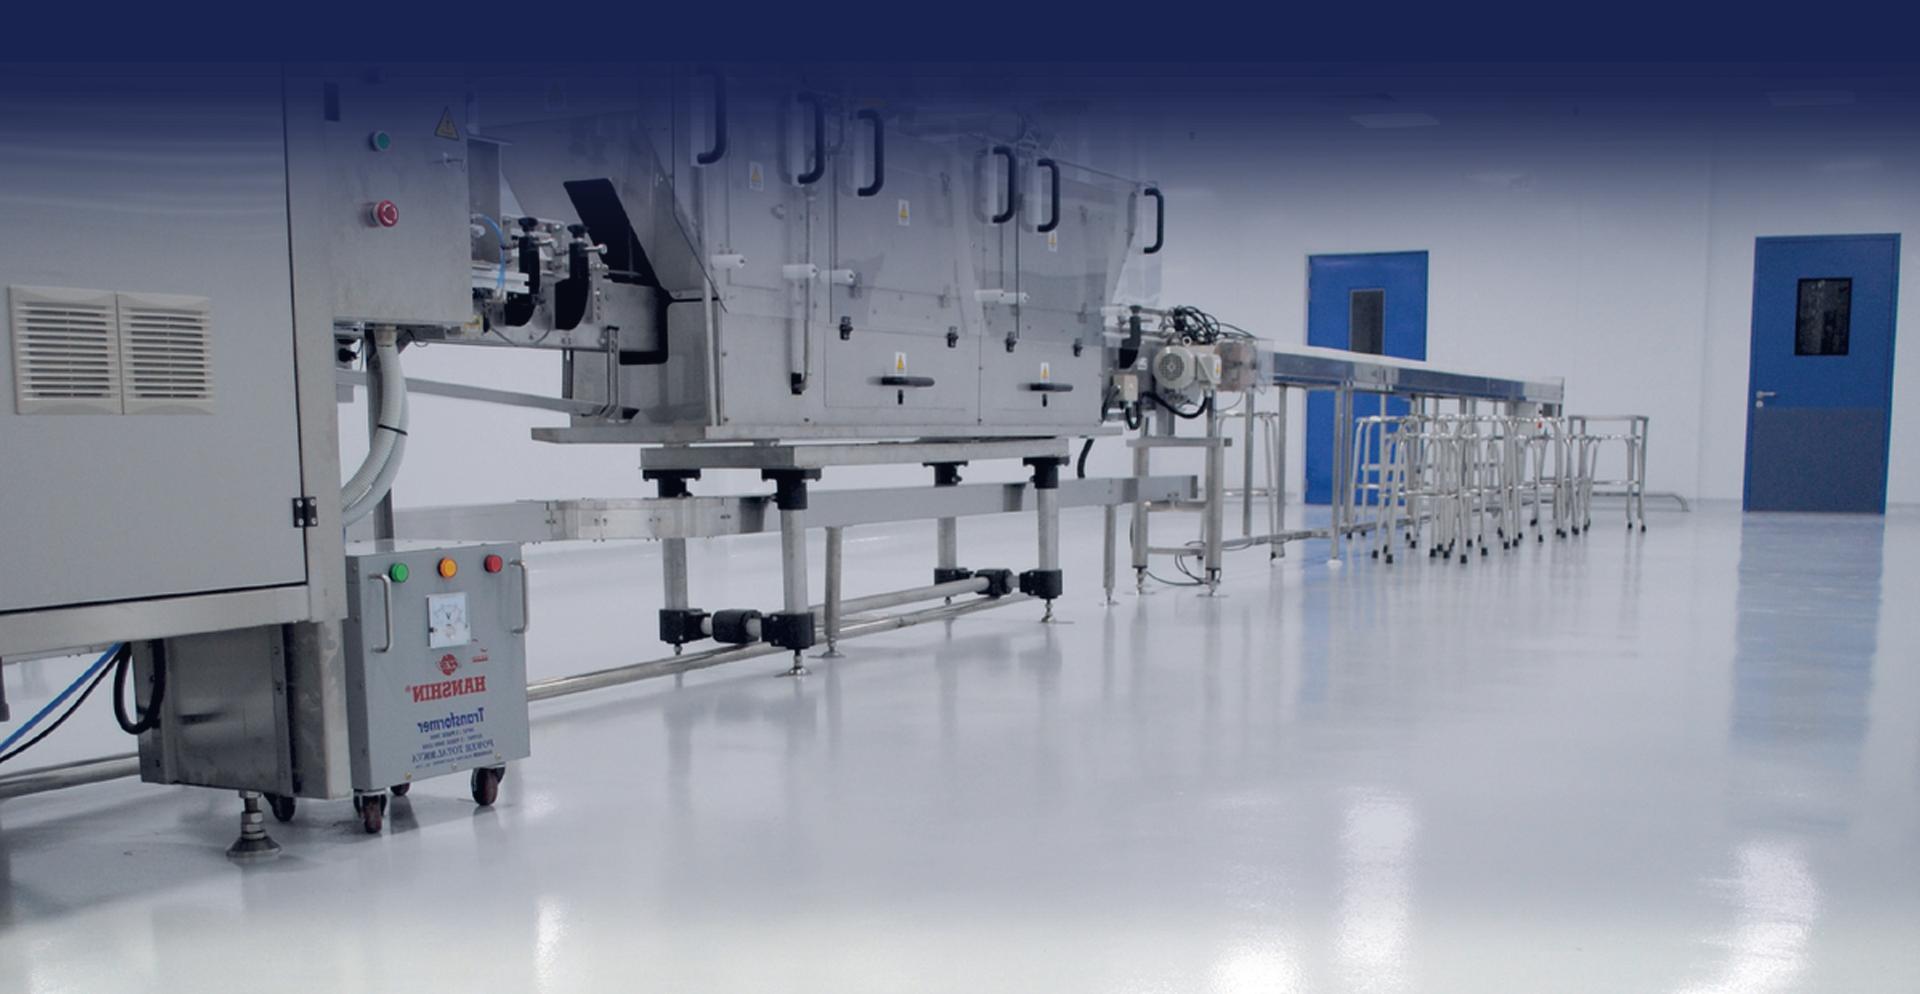 Electrostatic အကာအကွယ်အပေါ်ယံပိုင်းစနစ် KERACOTE ESP300